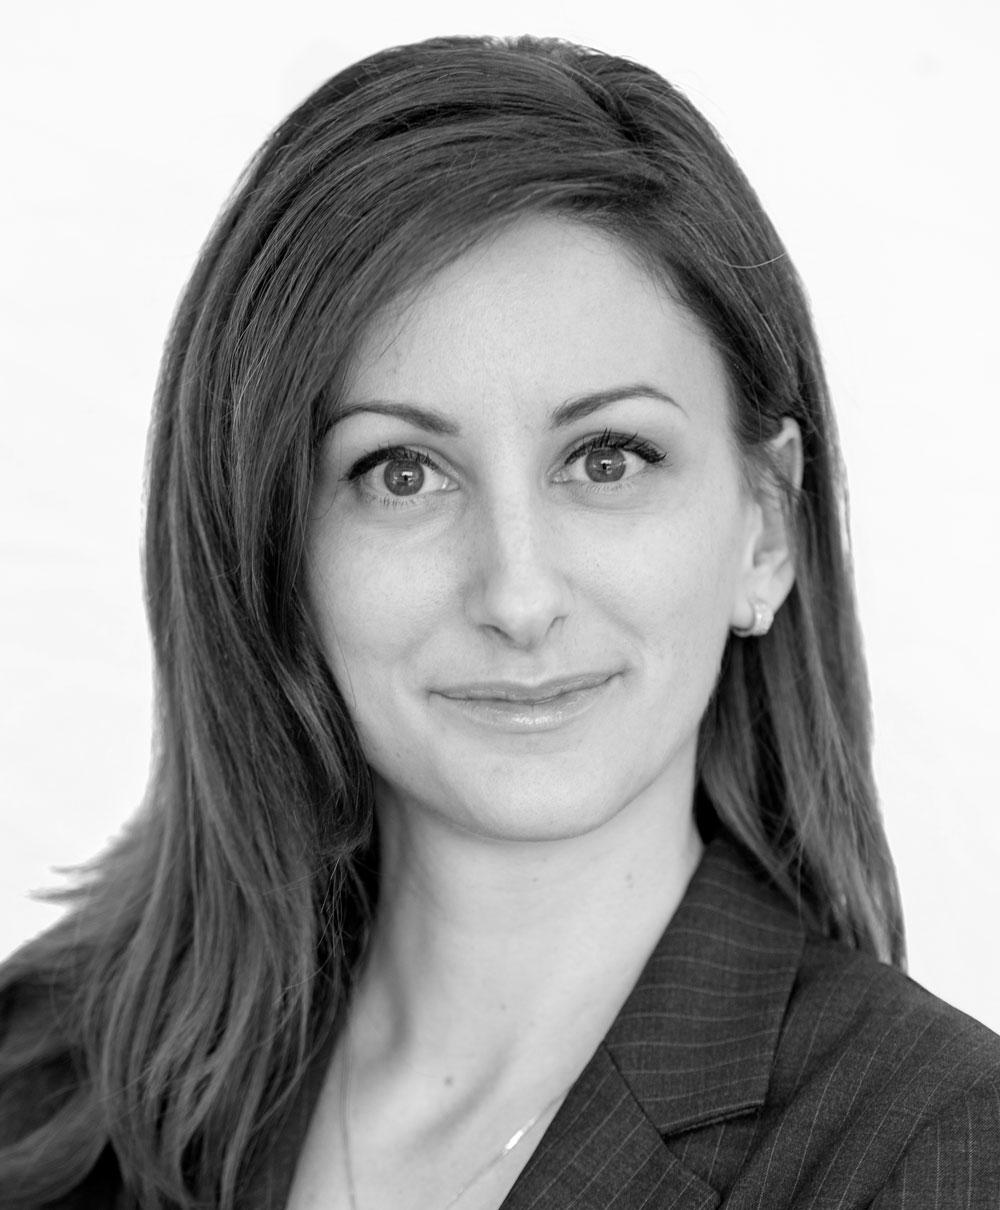 Headshot of Milena Radakovic